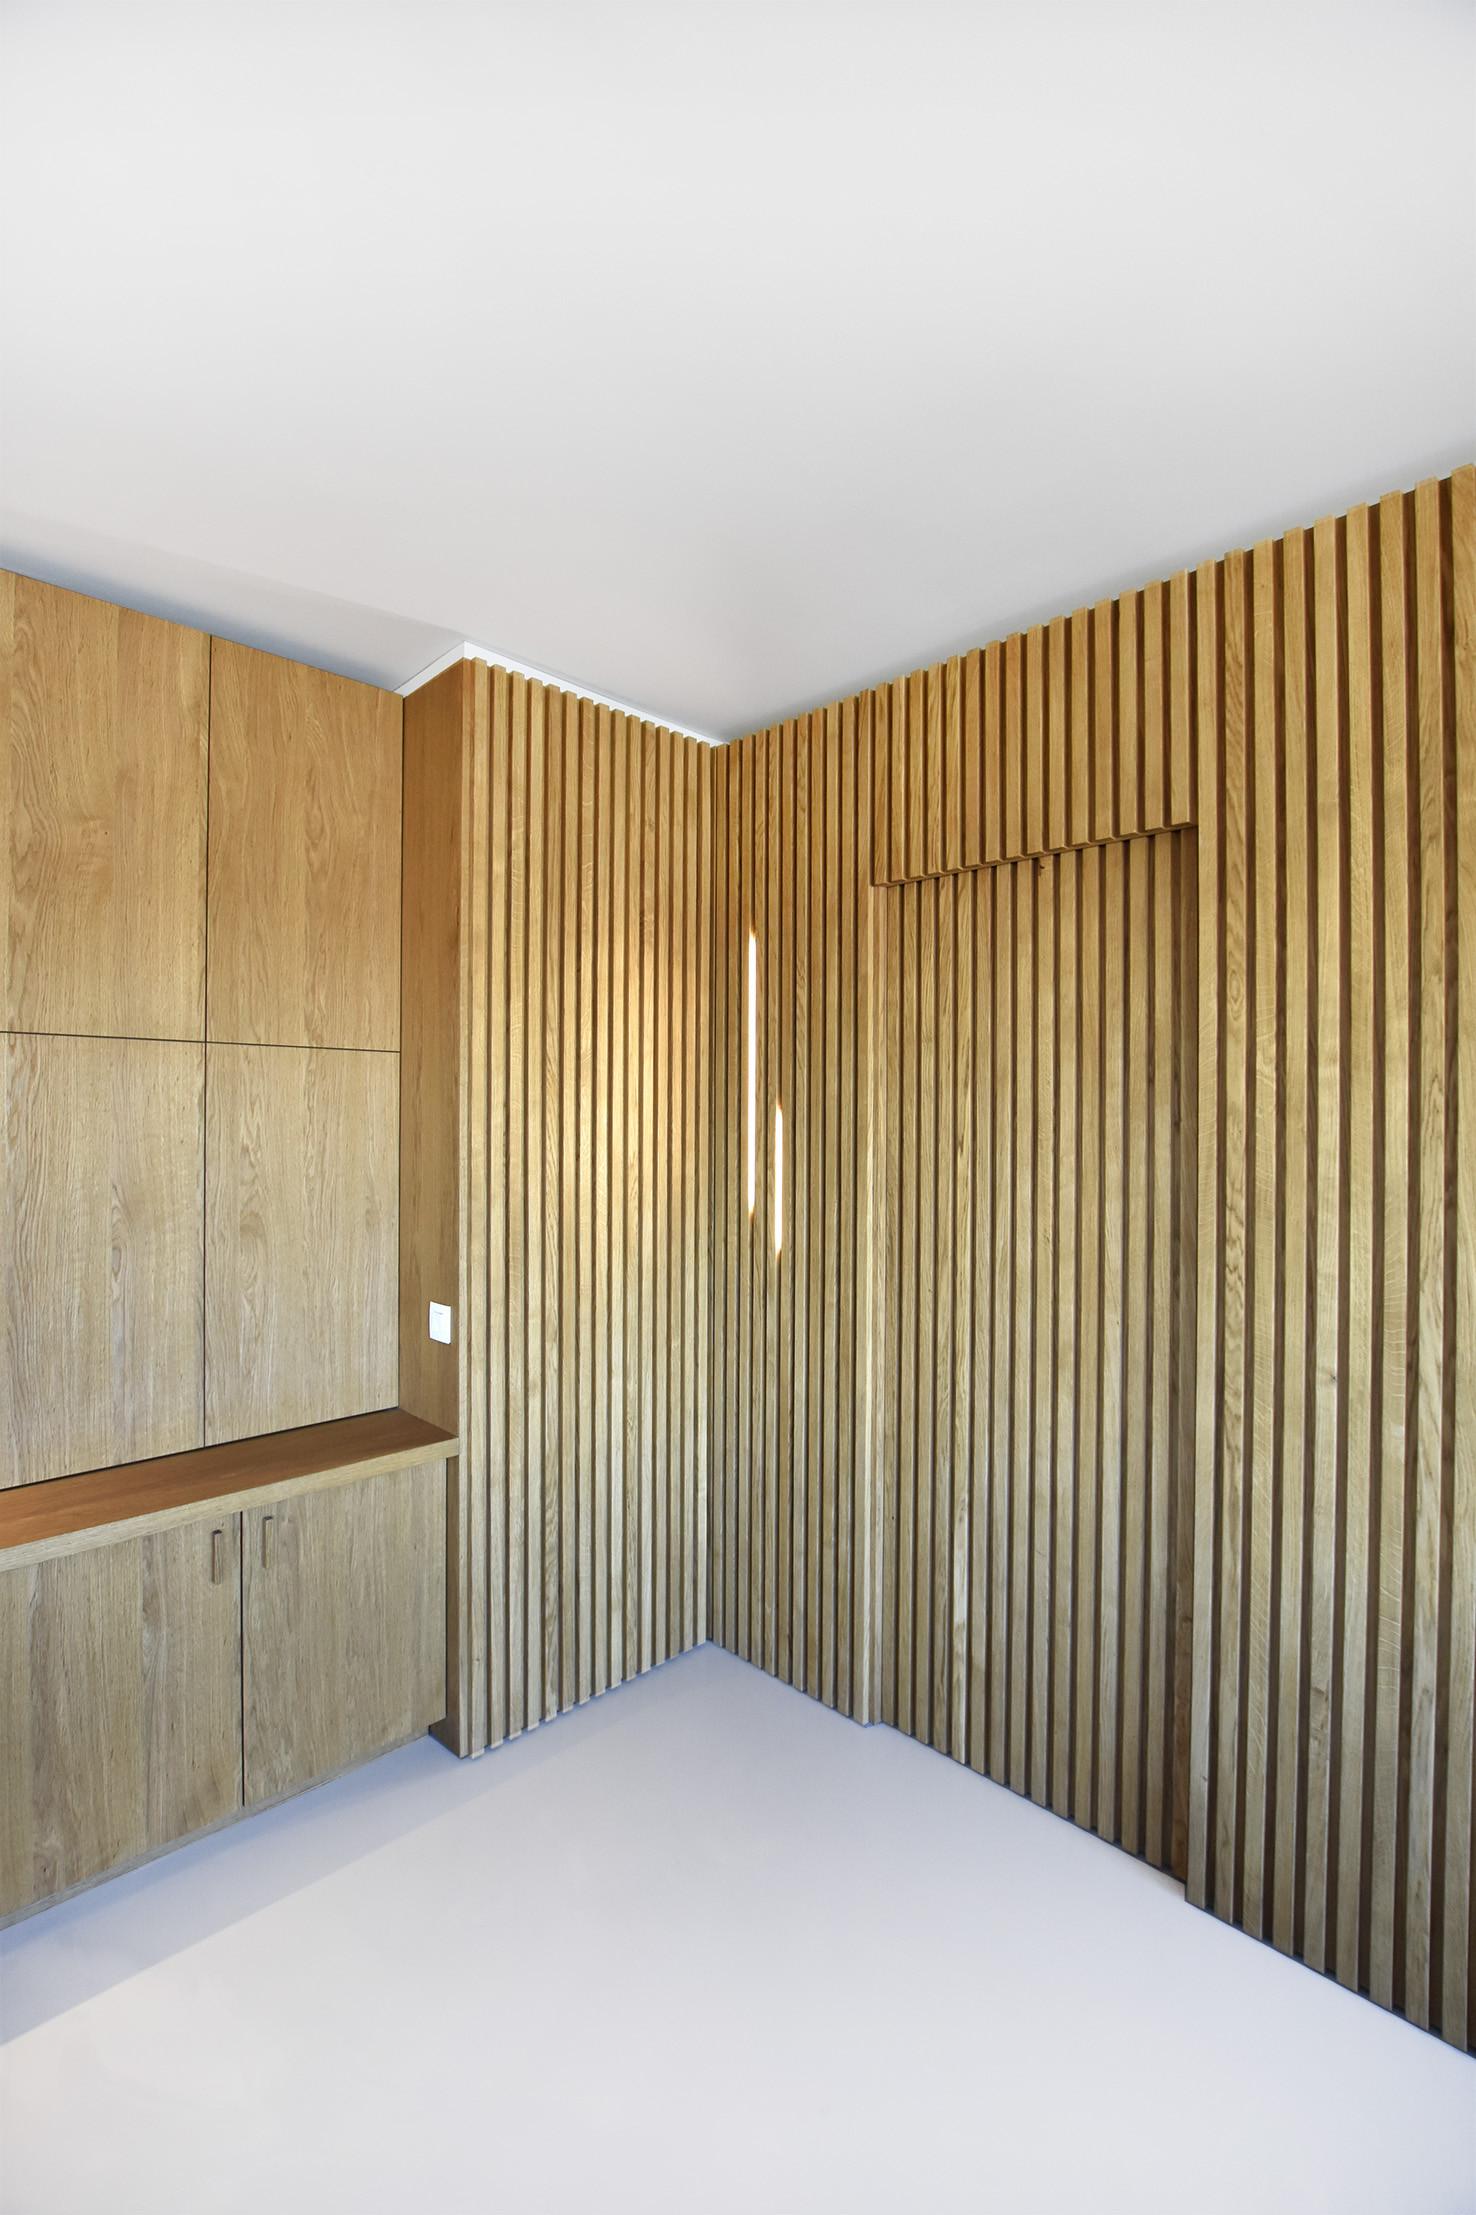 Design : Chouettes Architectes - Realisation : Woodblaster